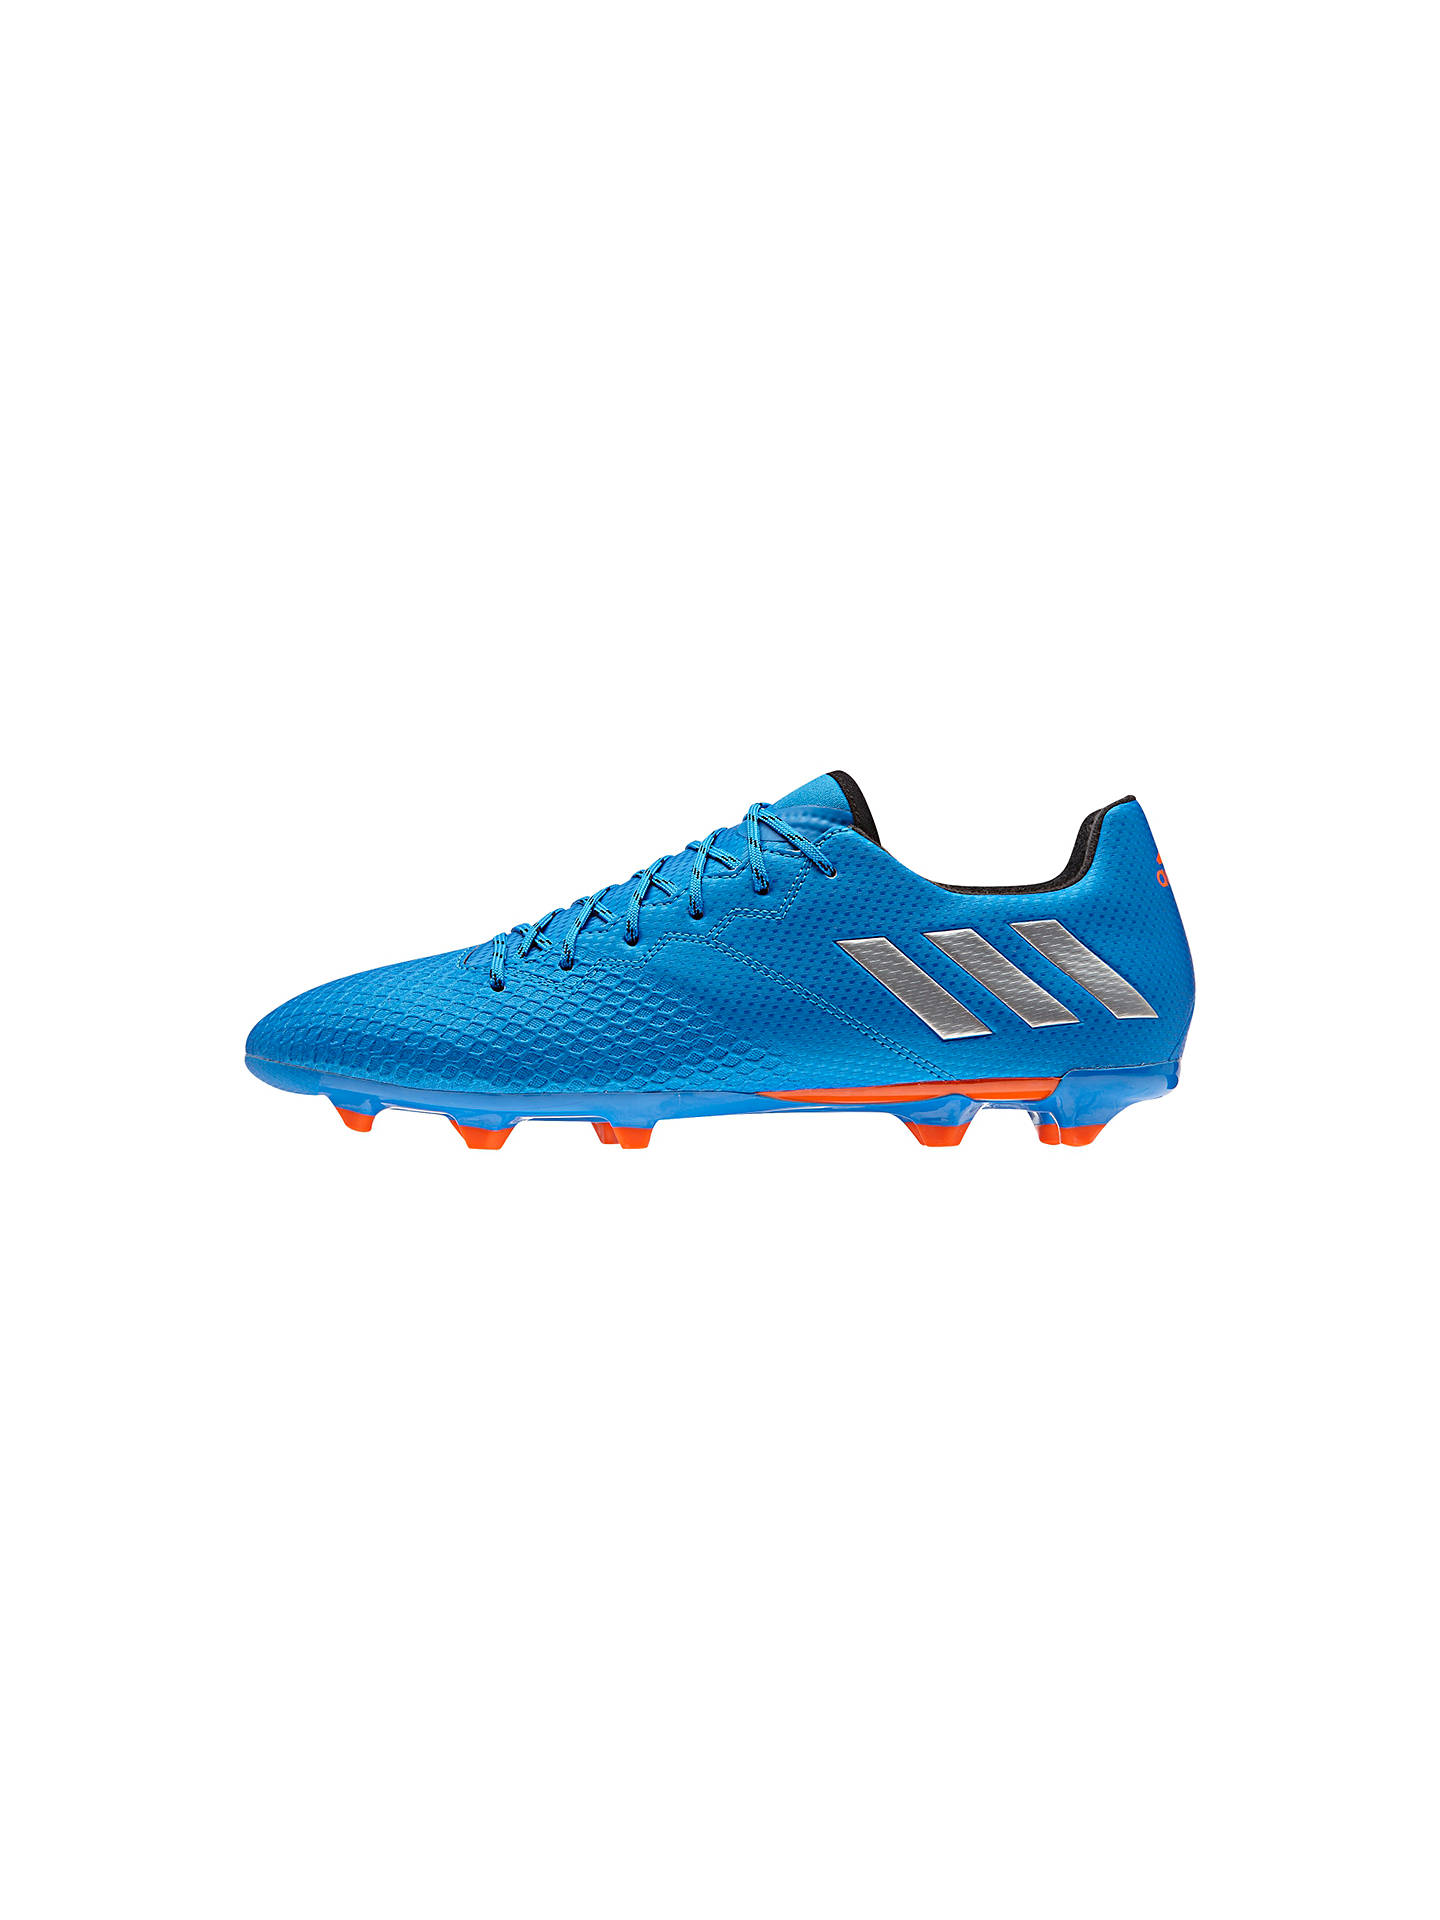 cheaper 275f8 ea5d1 Buy Adidas Messi 16.3 FG Men s Football Boots, Blue Silver, 7 Online at ...